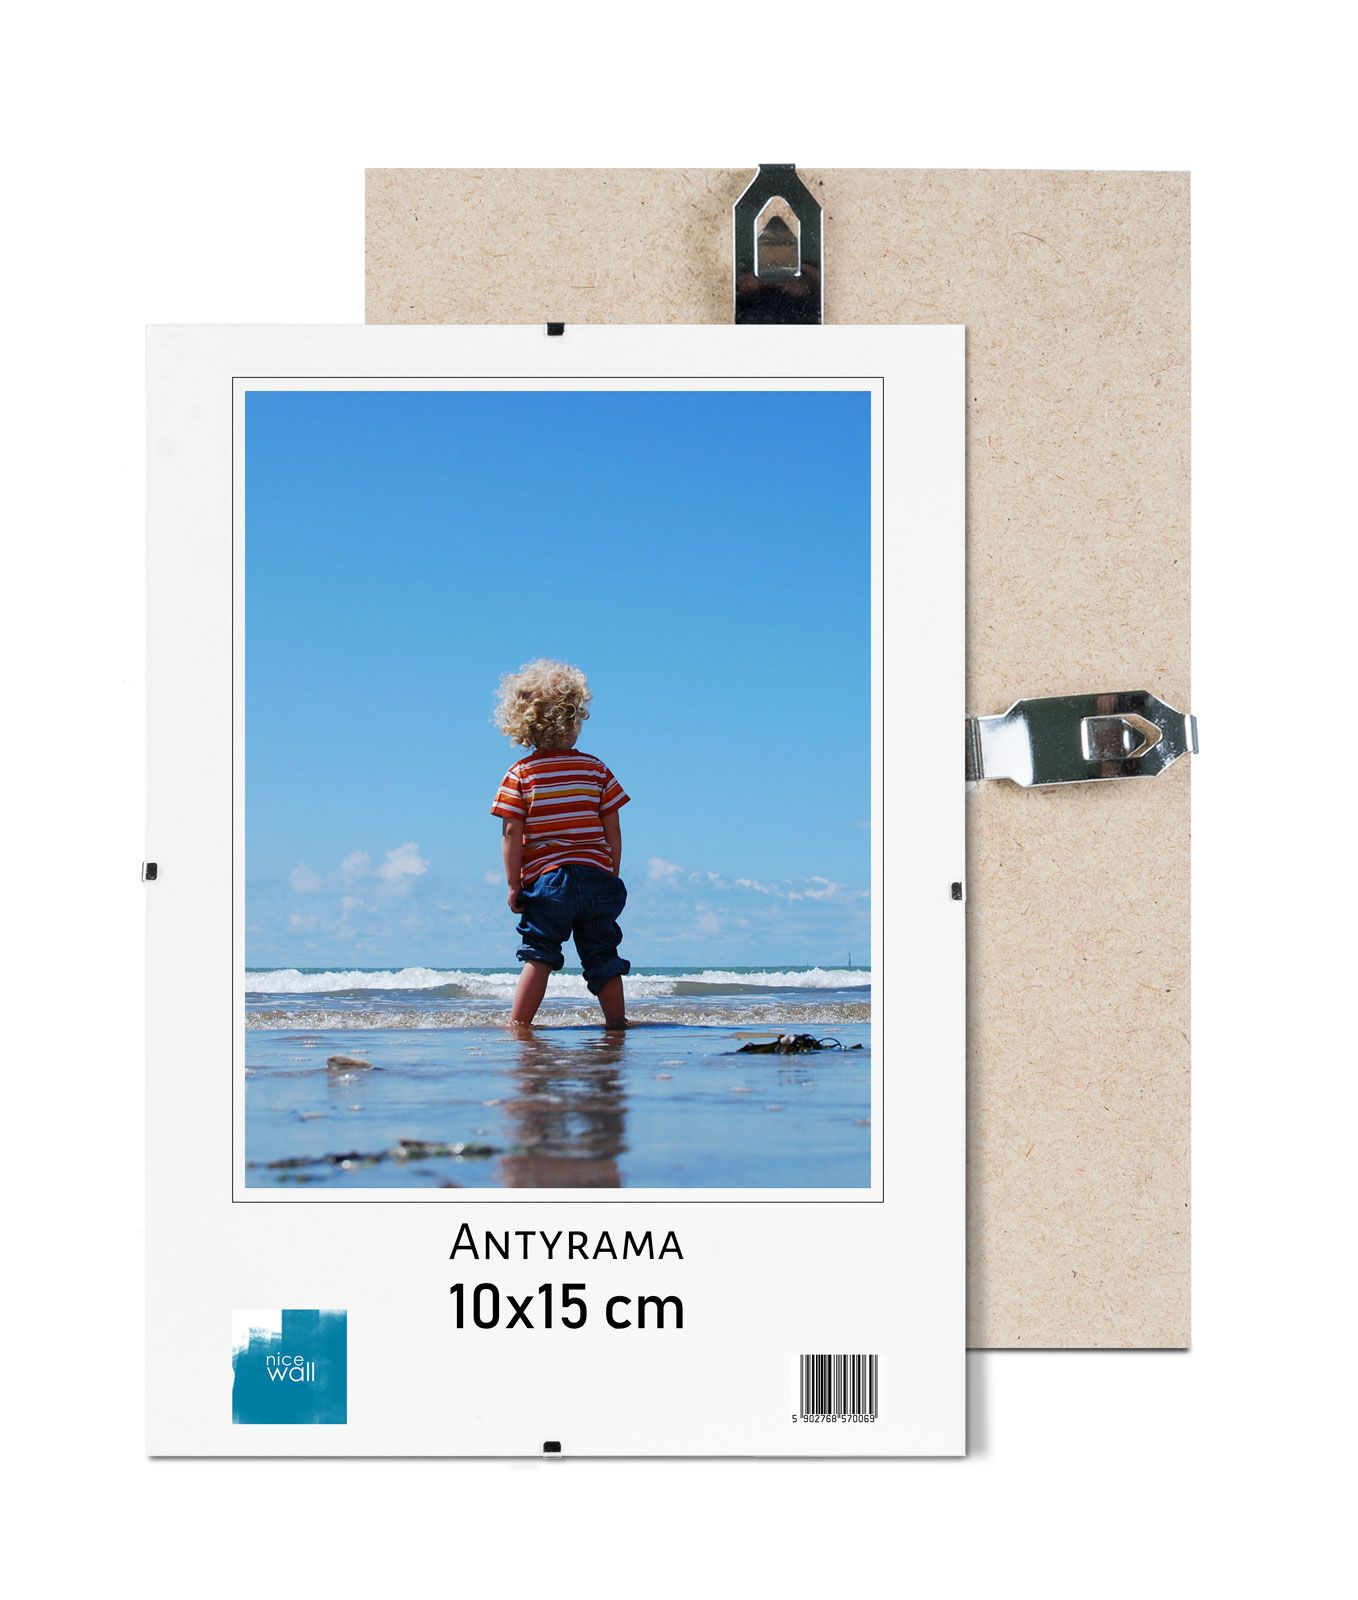 Antirama 10x15cm Antiramy 15x10cm Photo Frame A6